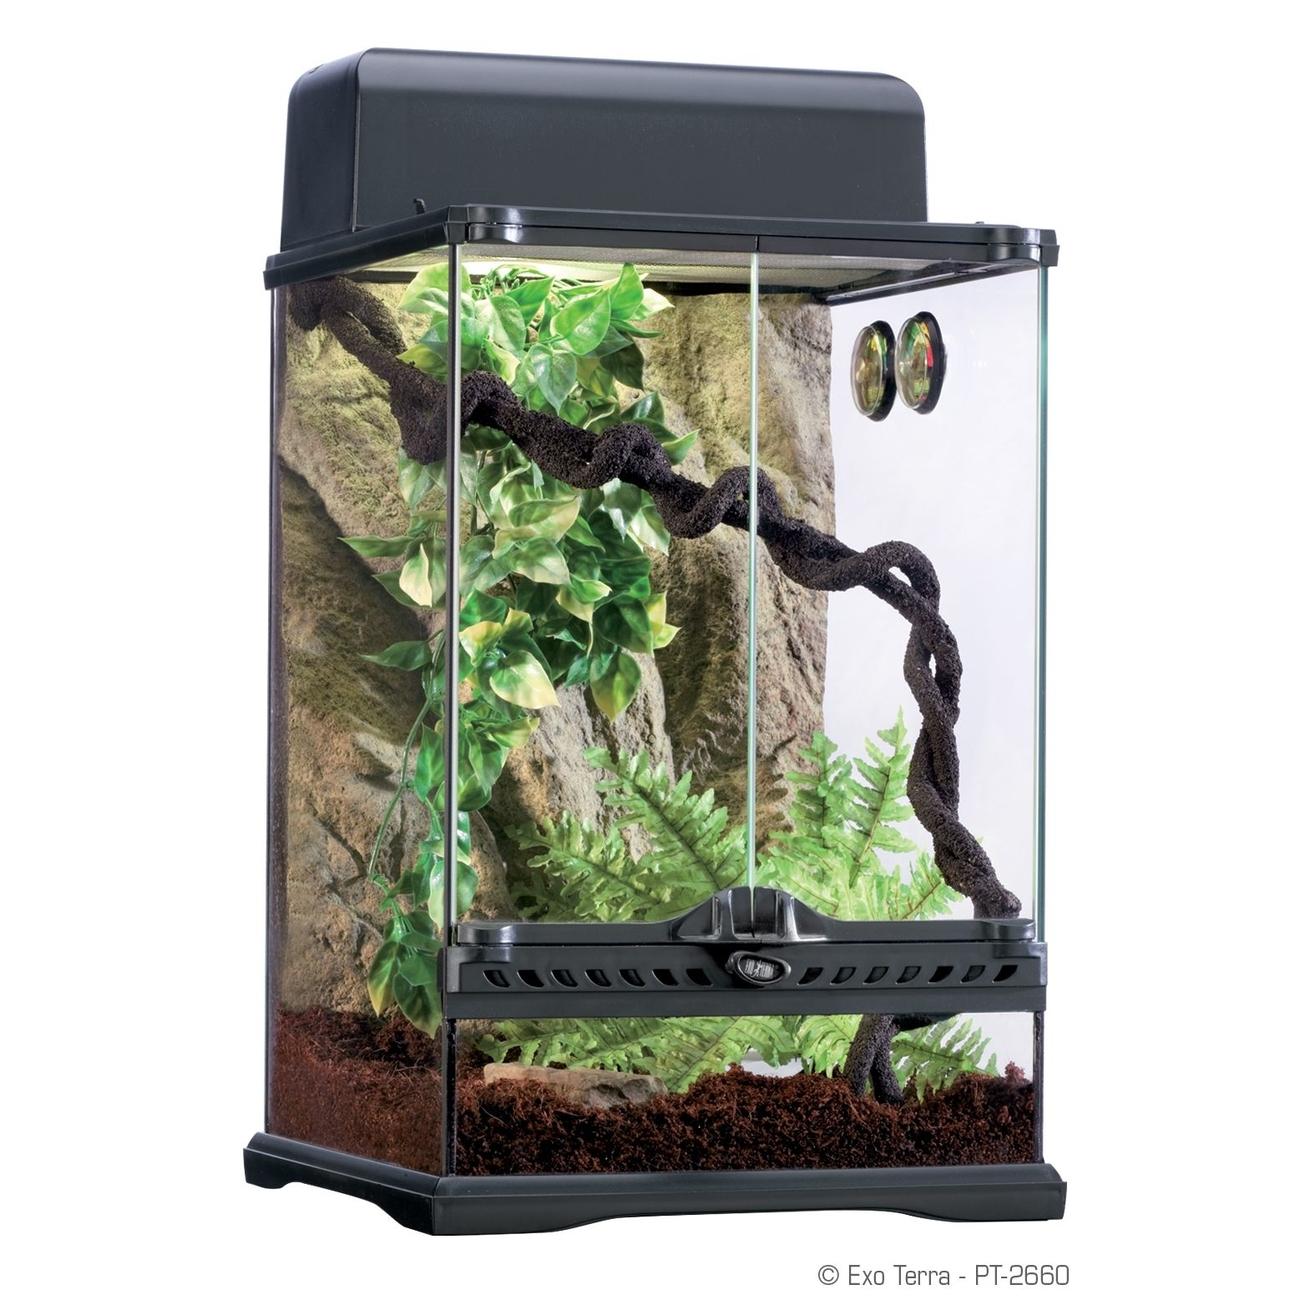 Exo Terra -  Rainforest Habitat Kit Bild 2